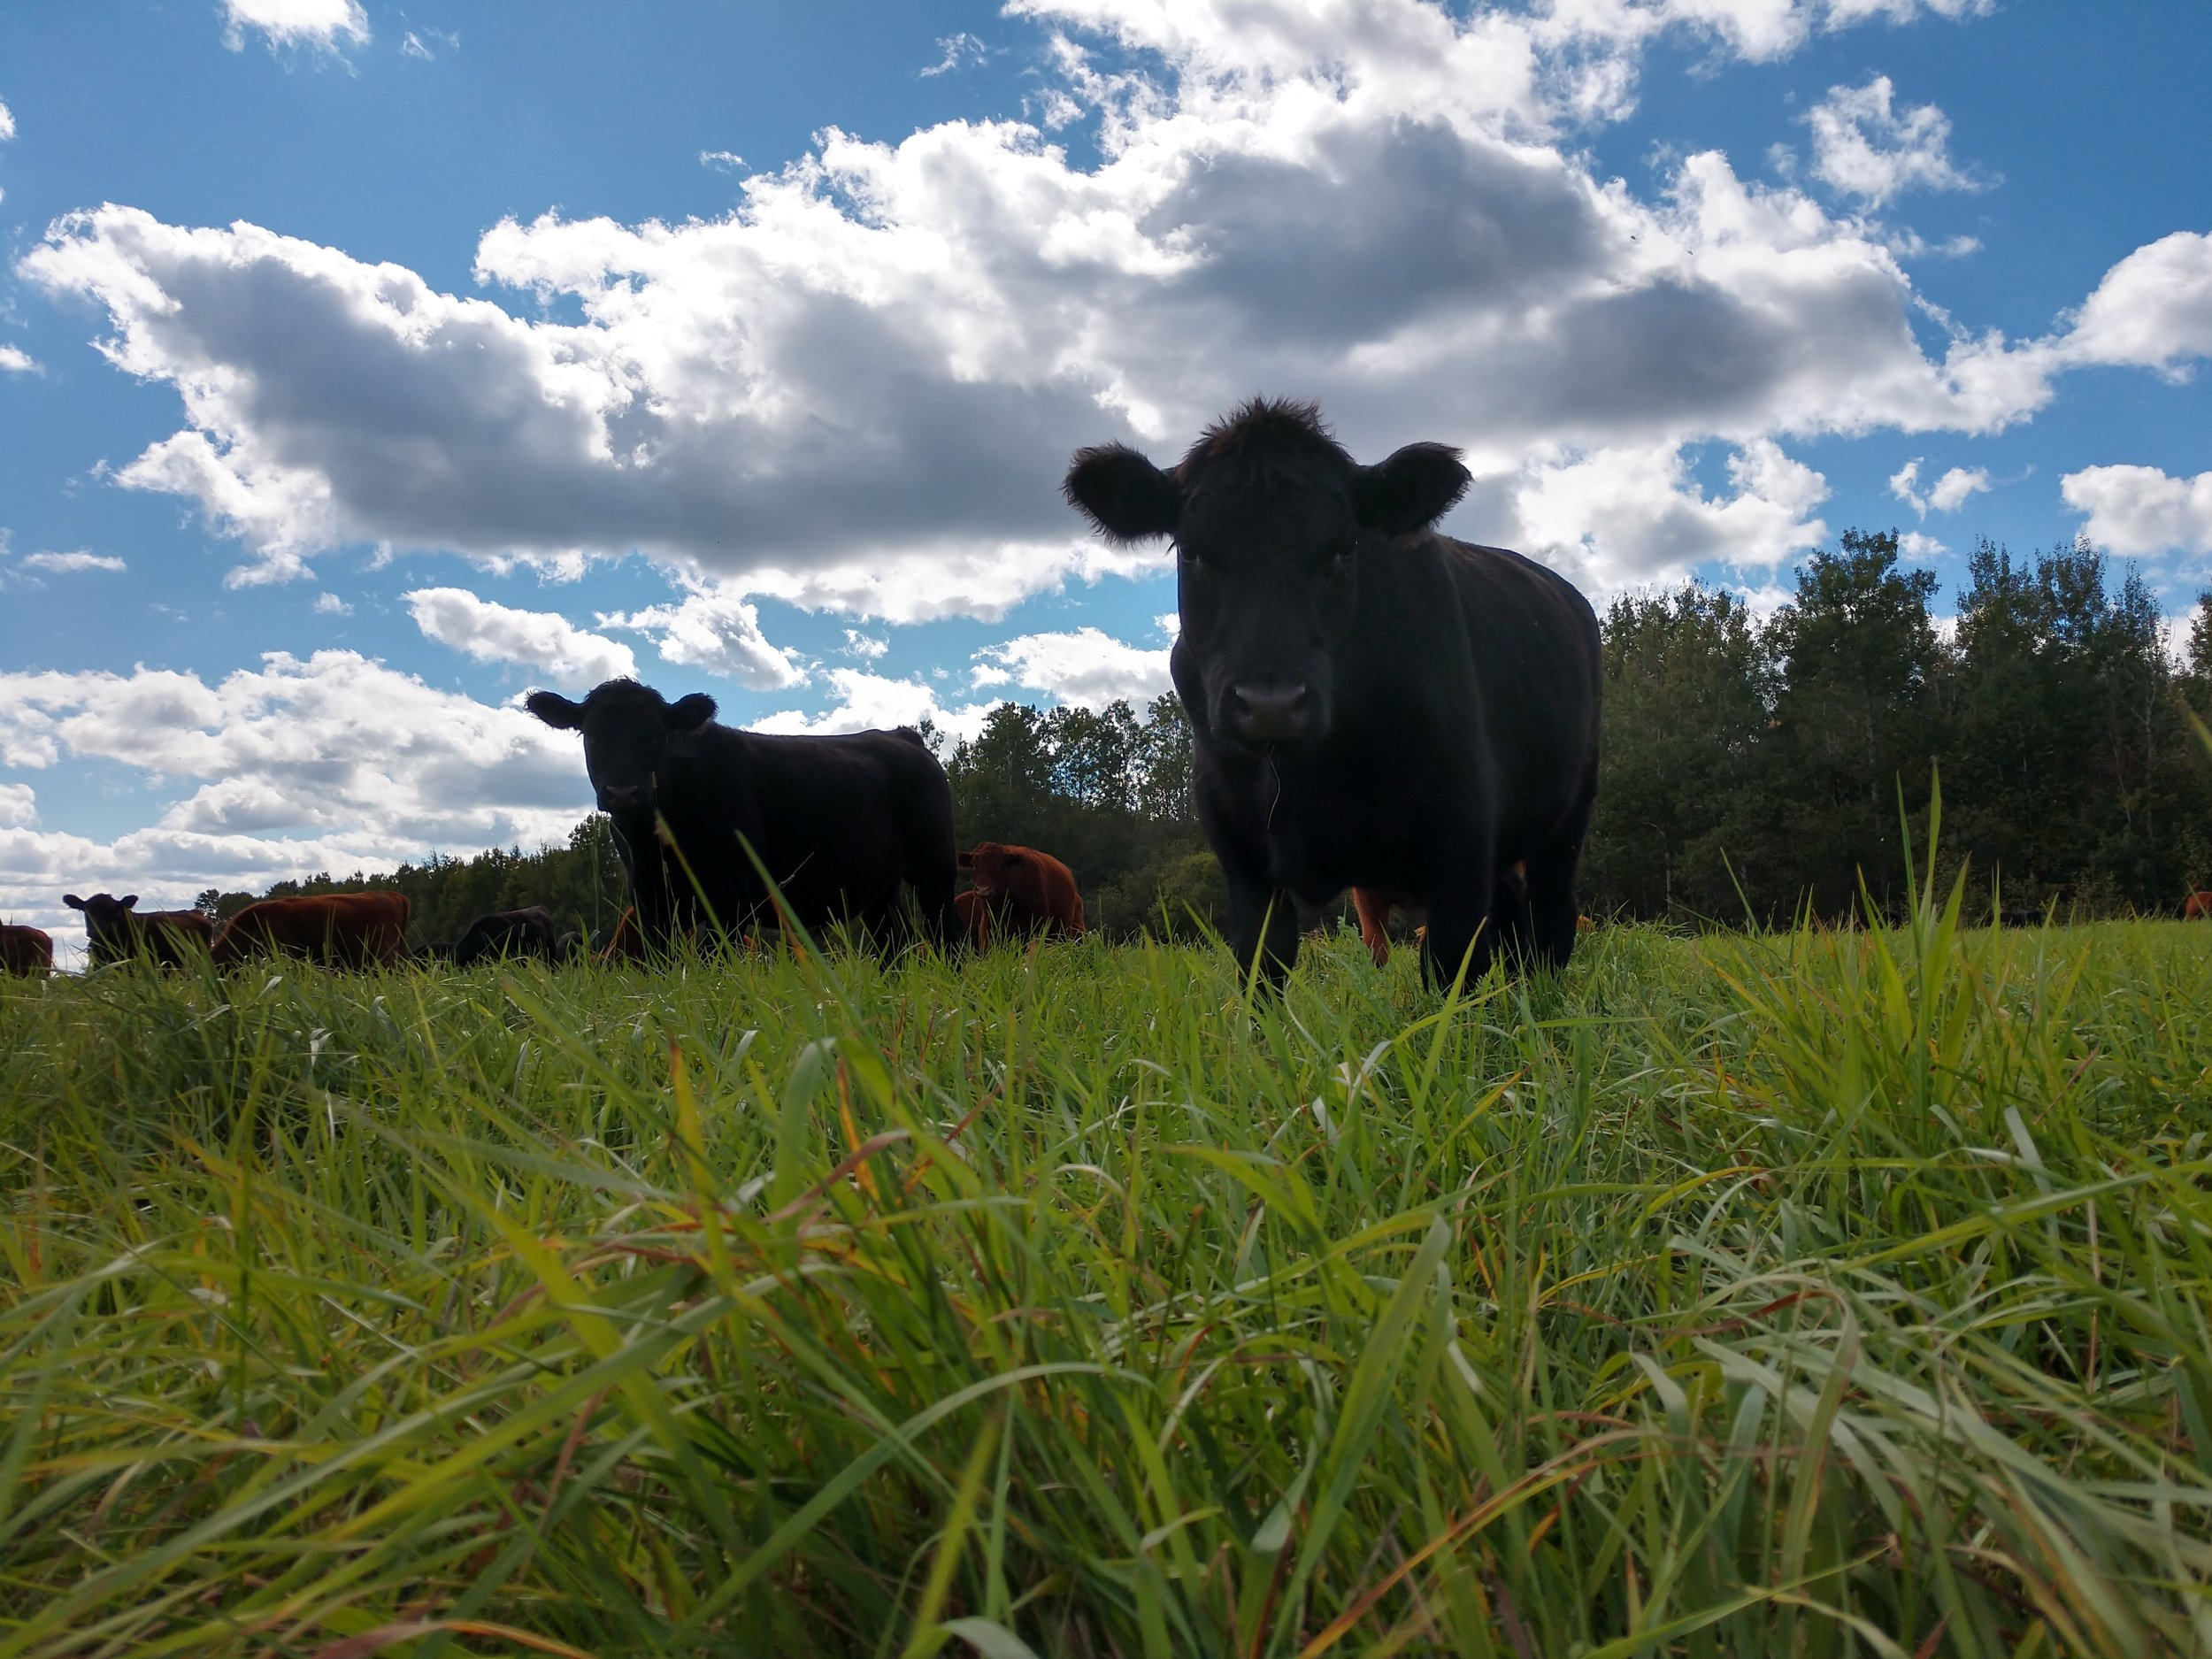 cover photo - cattle grazing under blue sky.jpg